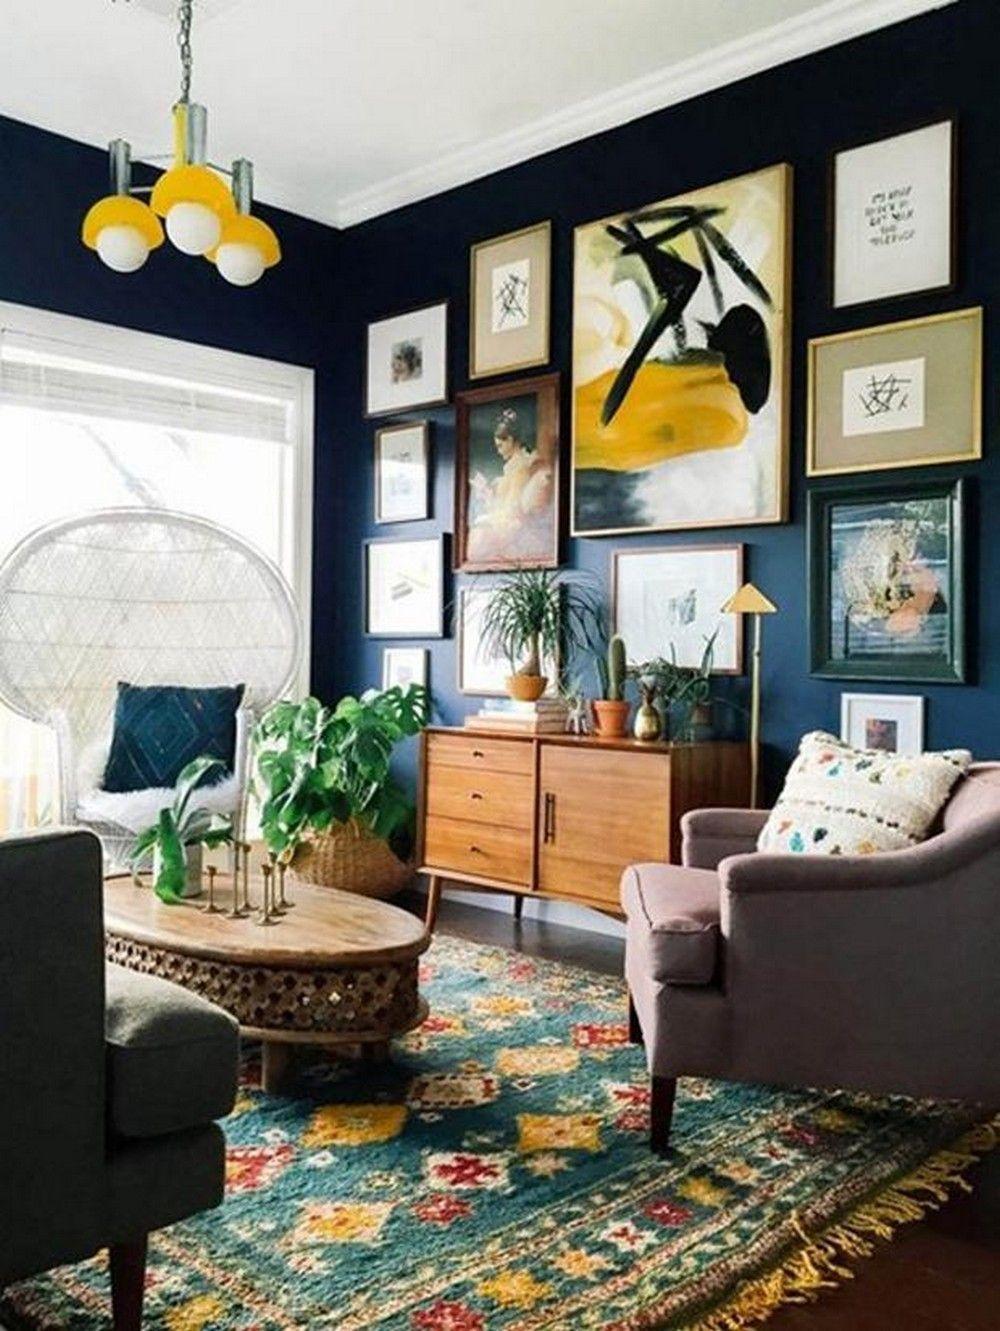 64 Best New Orleans Home Interior Design | Pinterest | Interiors ...